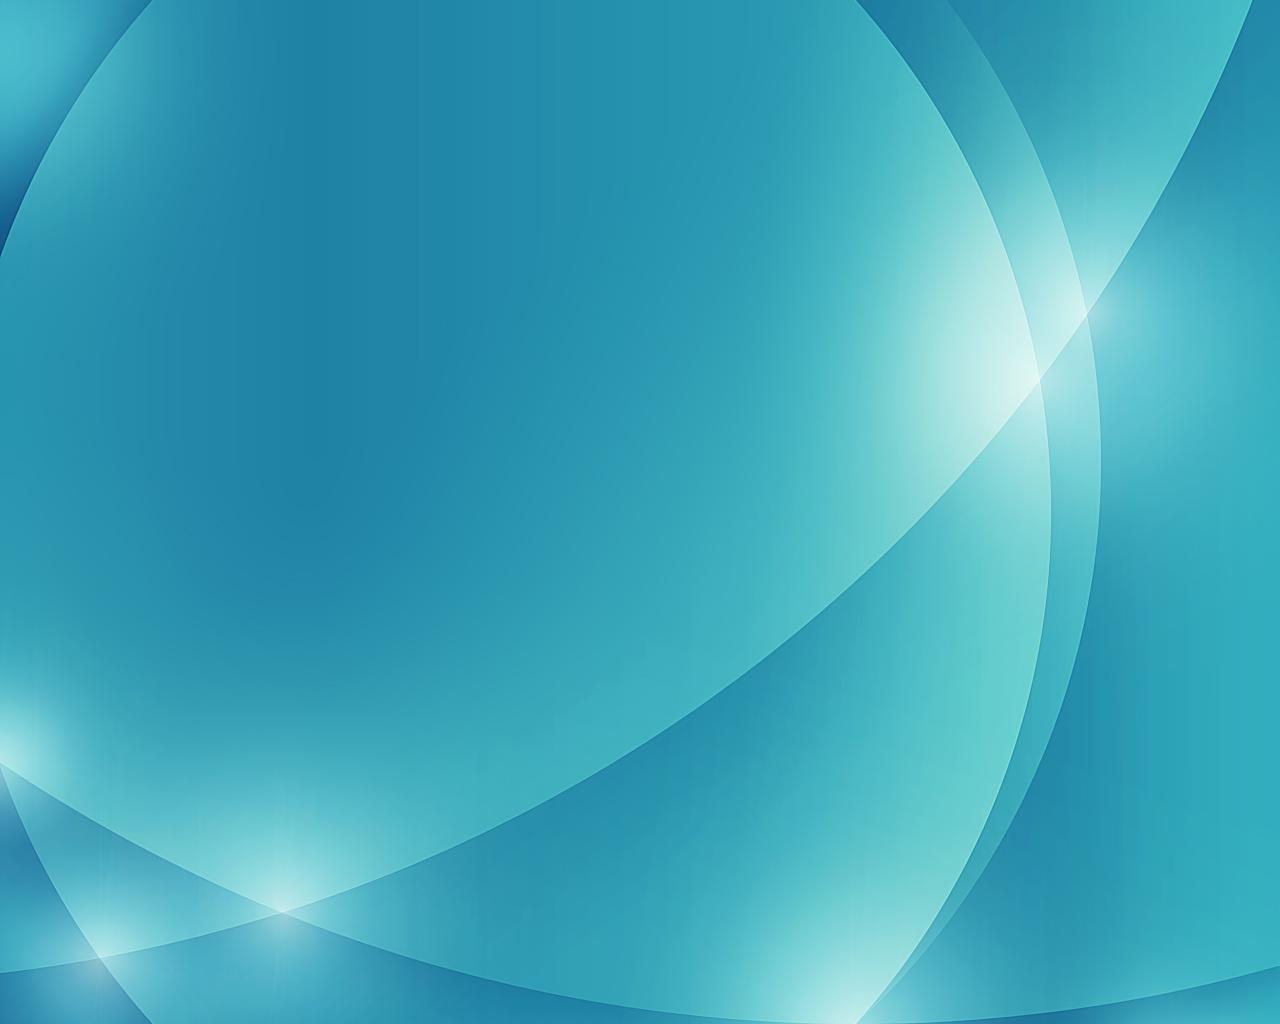 Wallpaper Bluos: Blue Wallpaper